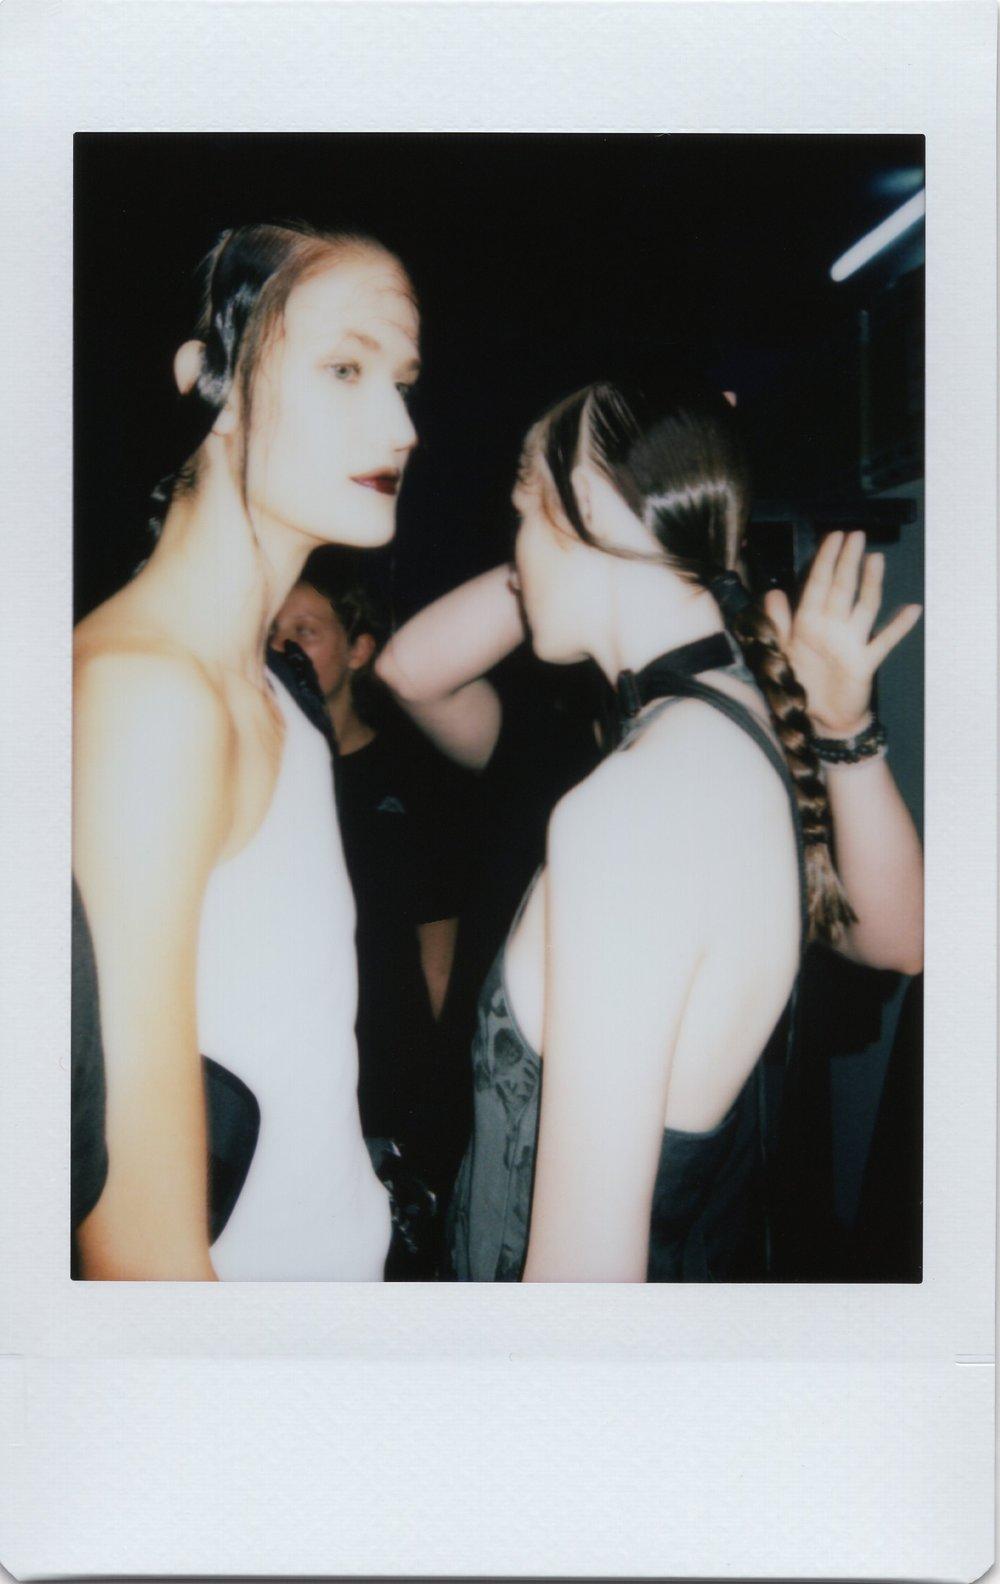 YangLi_Honigschreck_Backstage_Polaroid_10.jpg